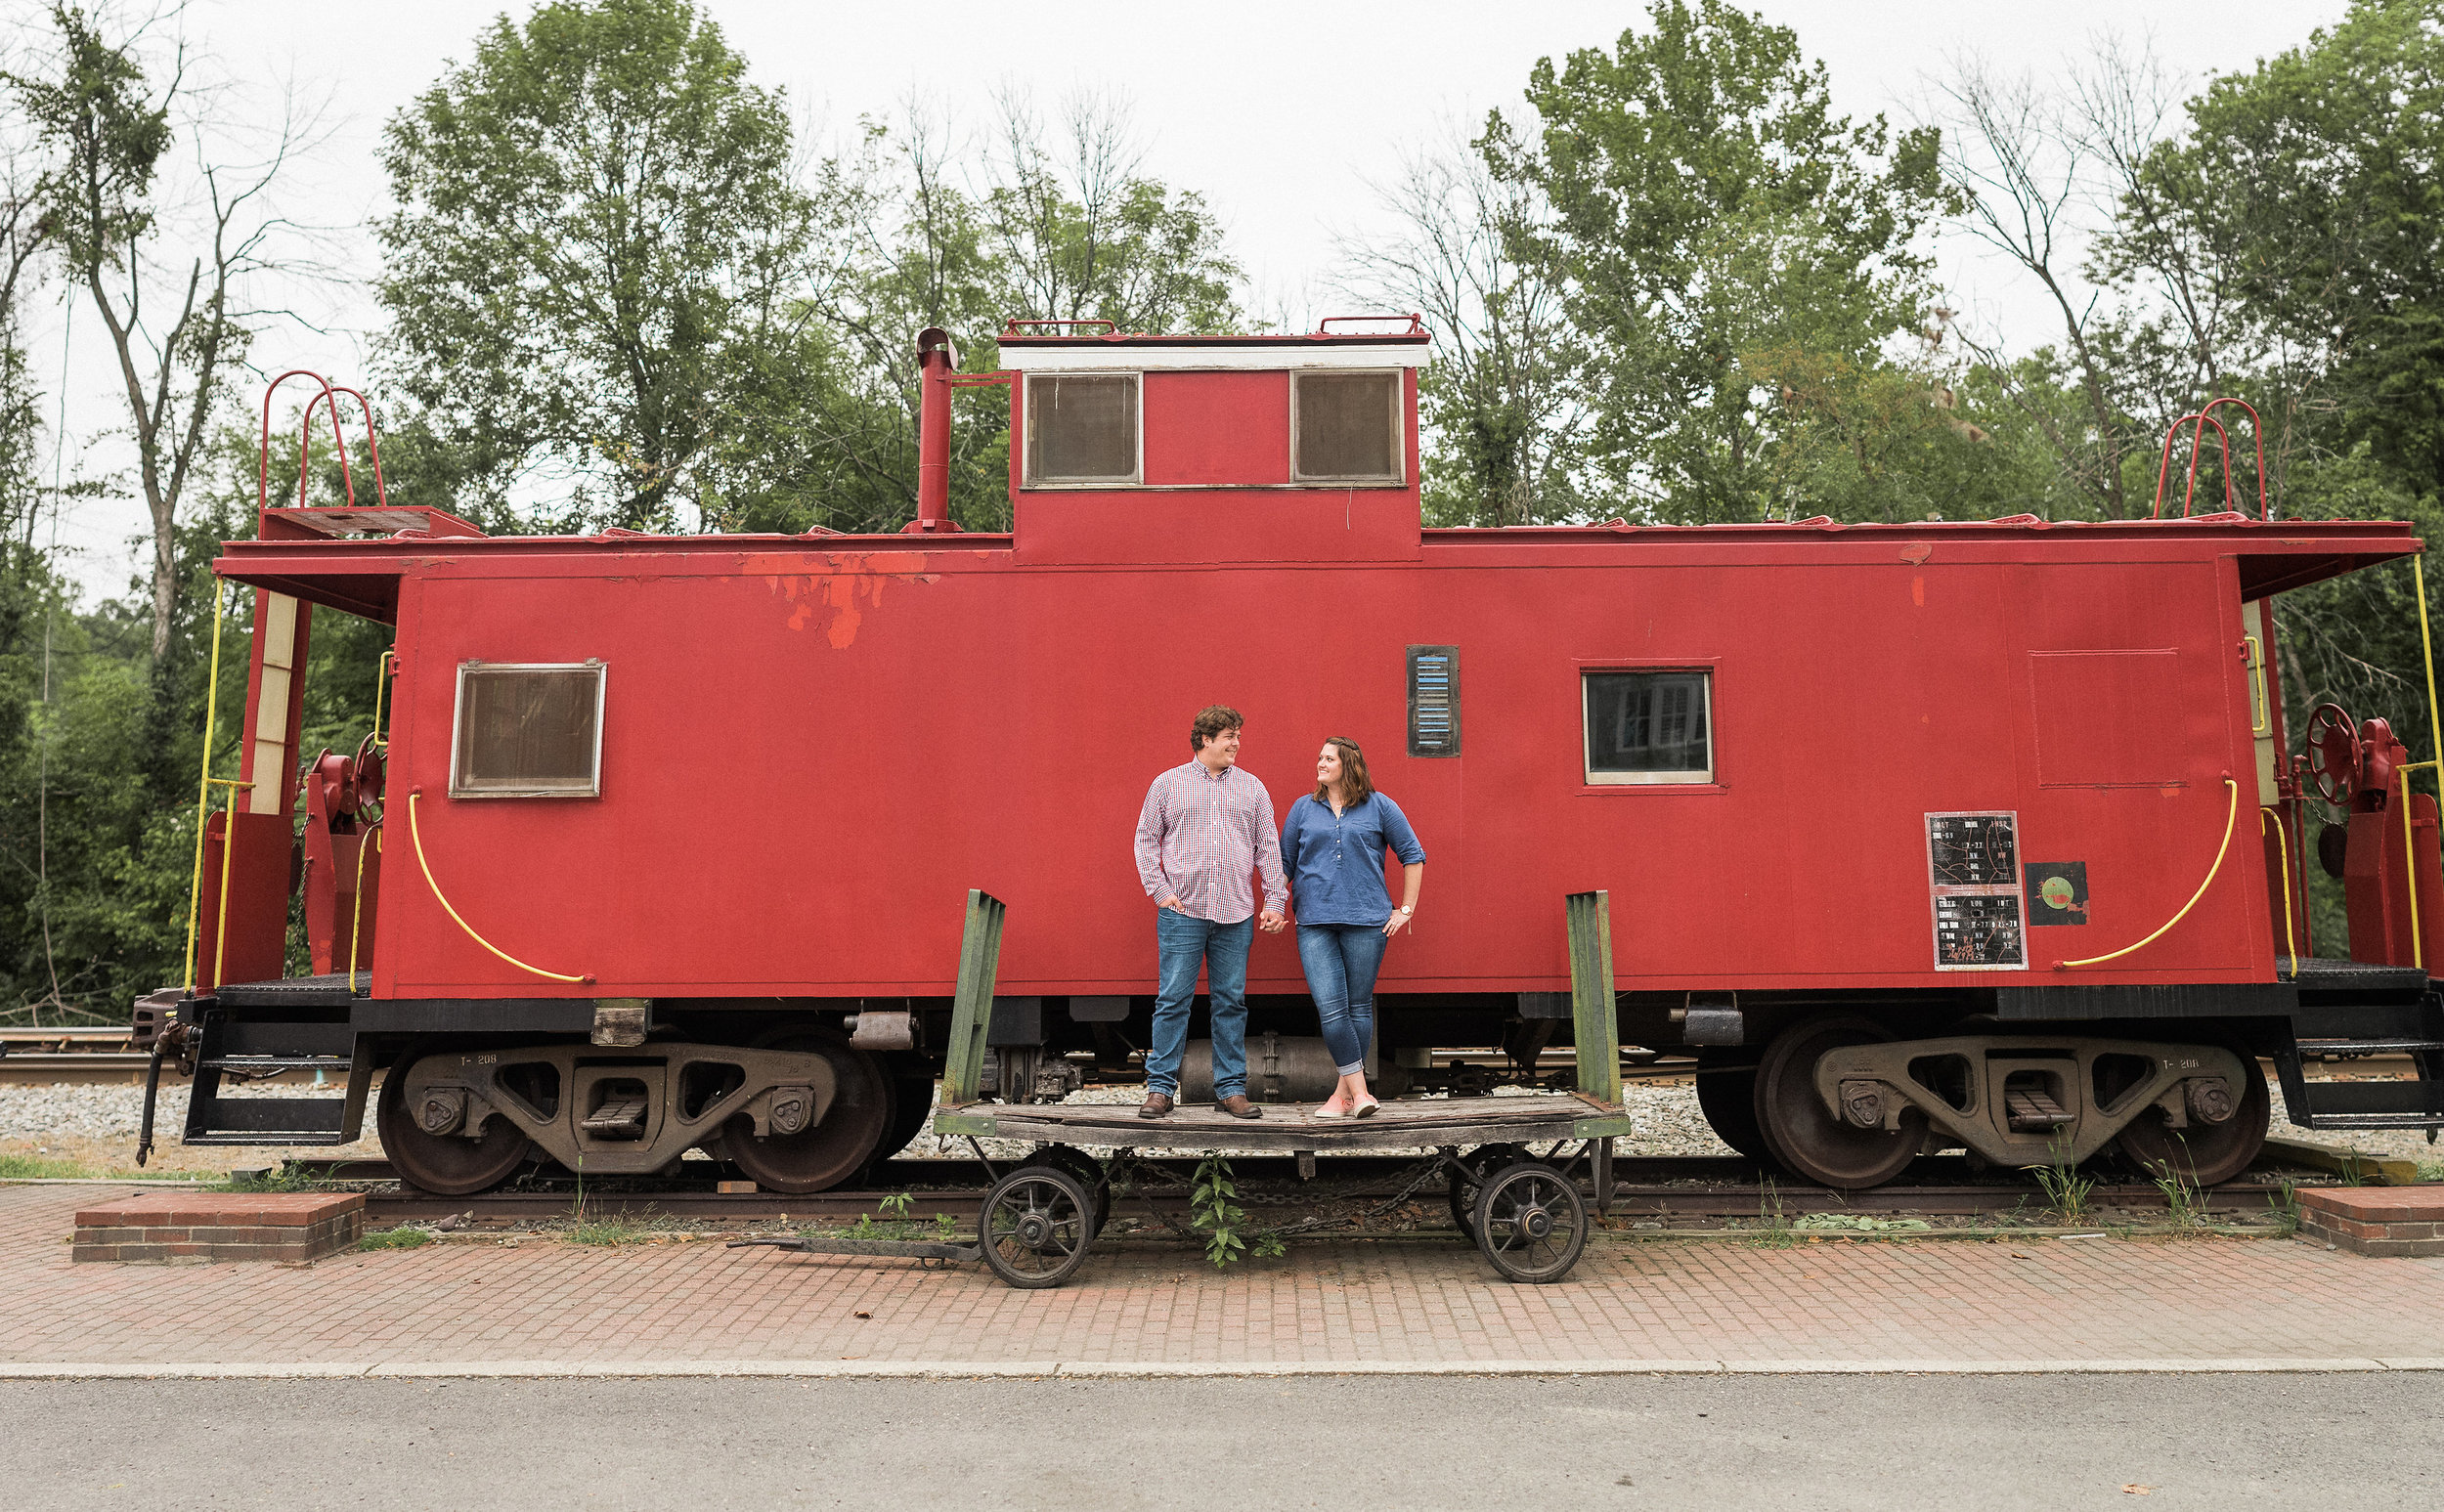 Couple standing on train platform